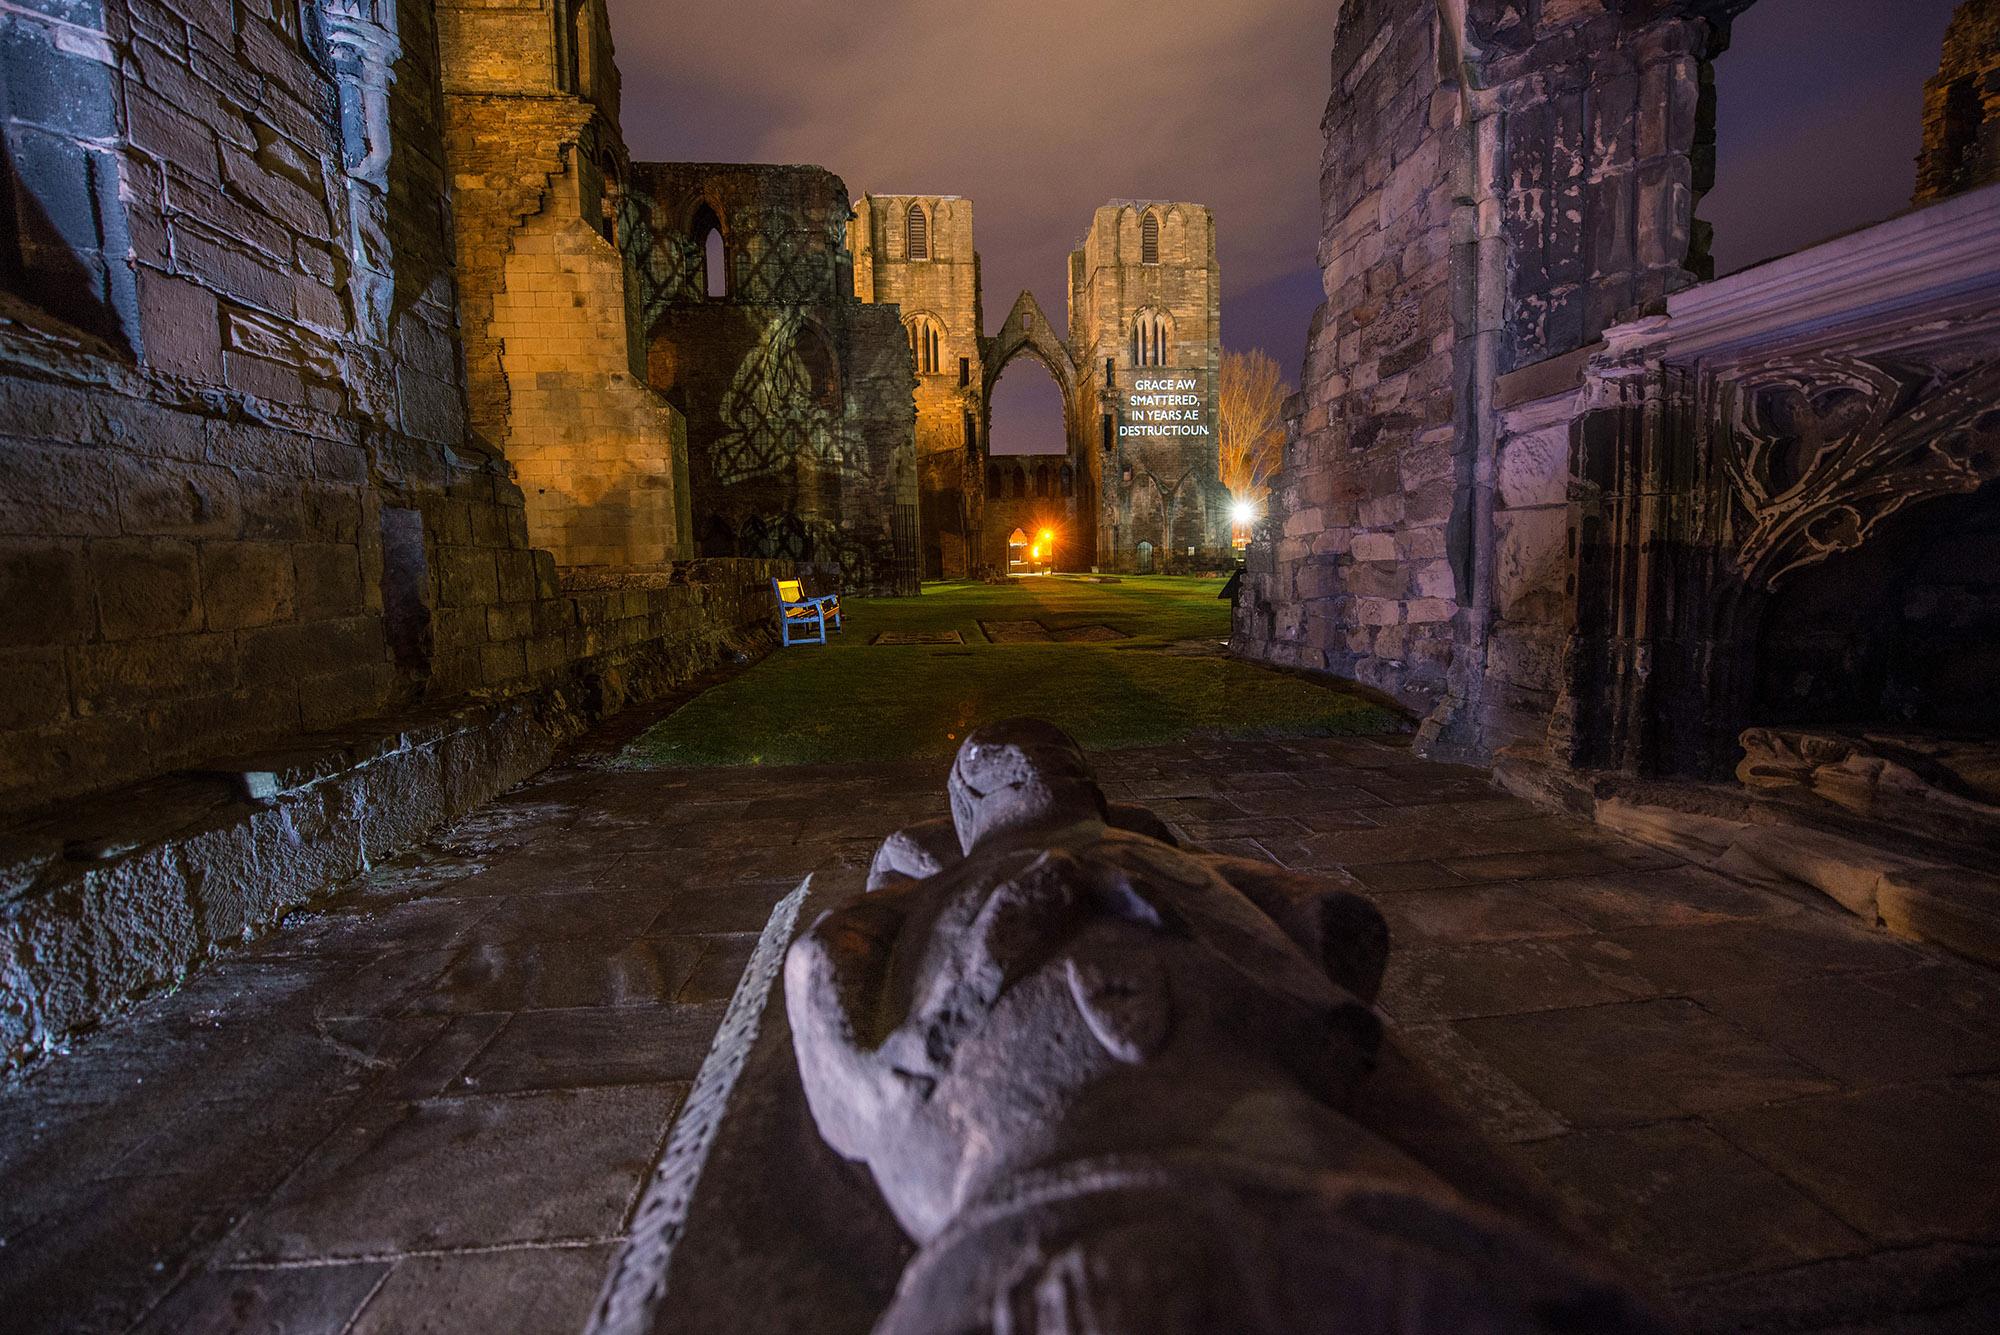 Òran nan Clachan projection timelapse film, Elgin Cathedral